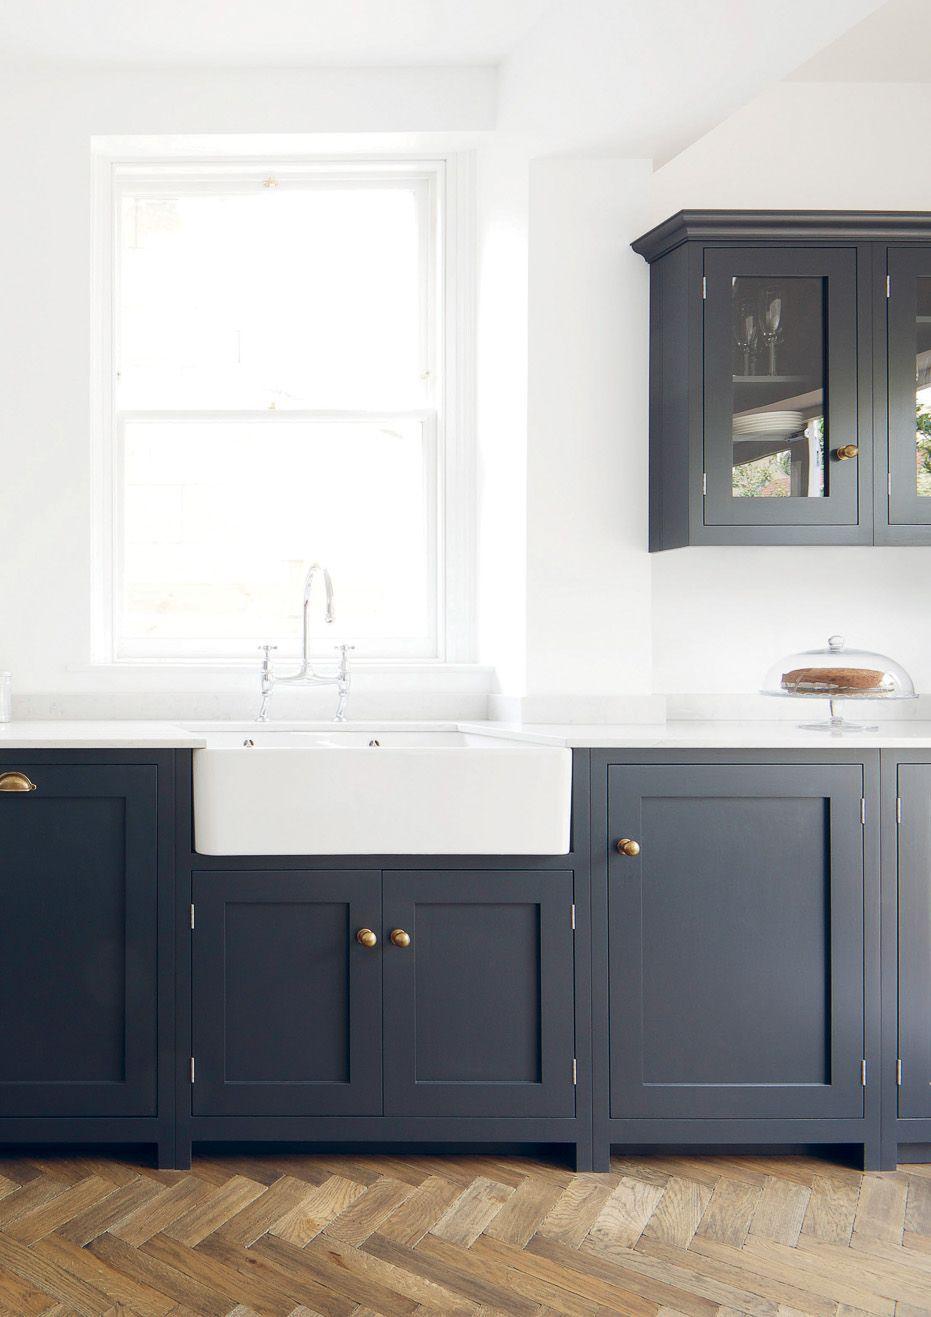 Shaker Brochure Devol Kitchens And Interiors Kitchen Cabinet